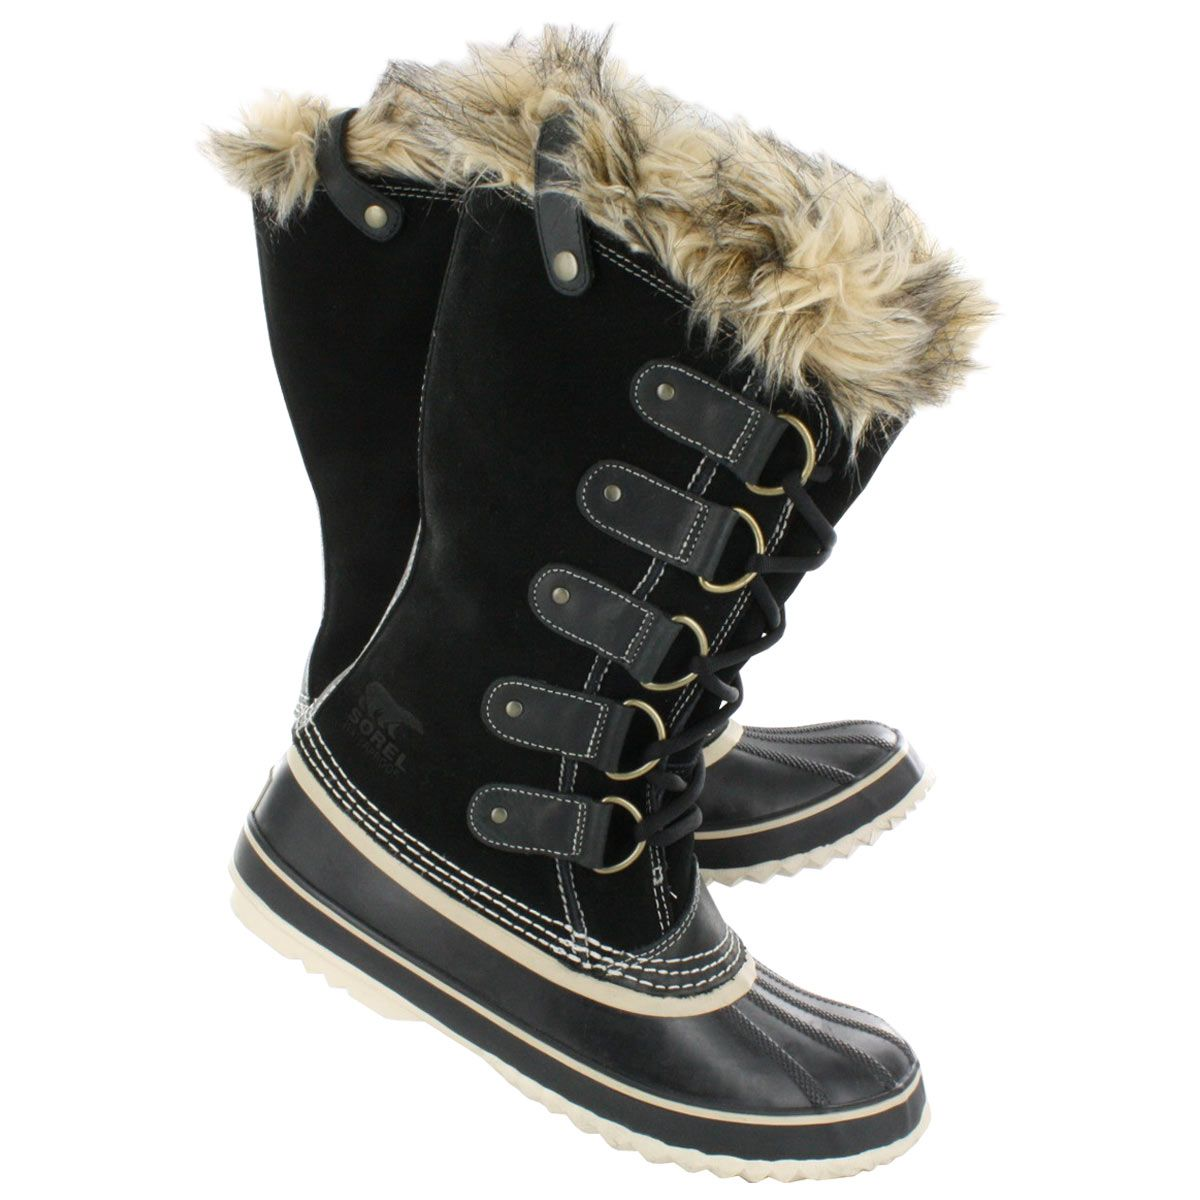 sorel s joan of arctic black winter boots nl1540 010